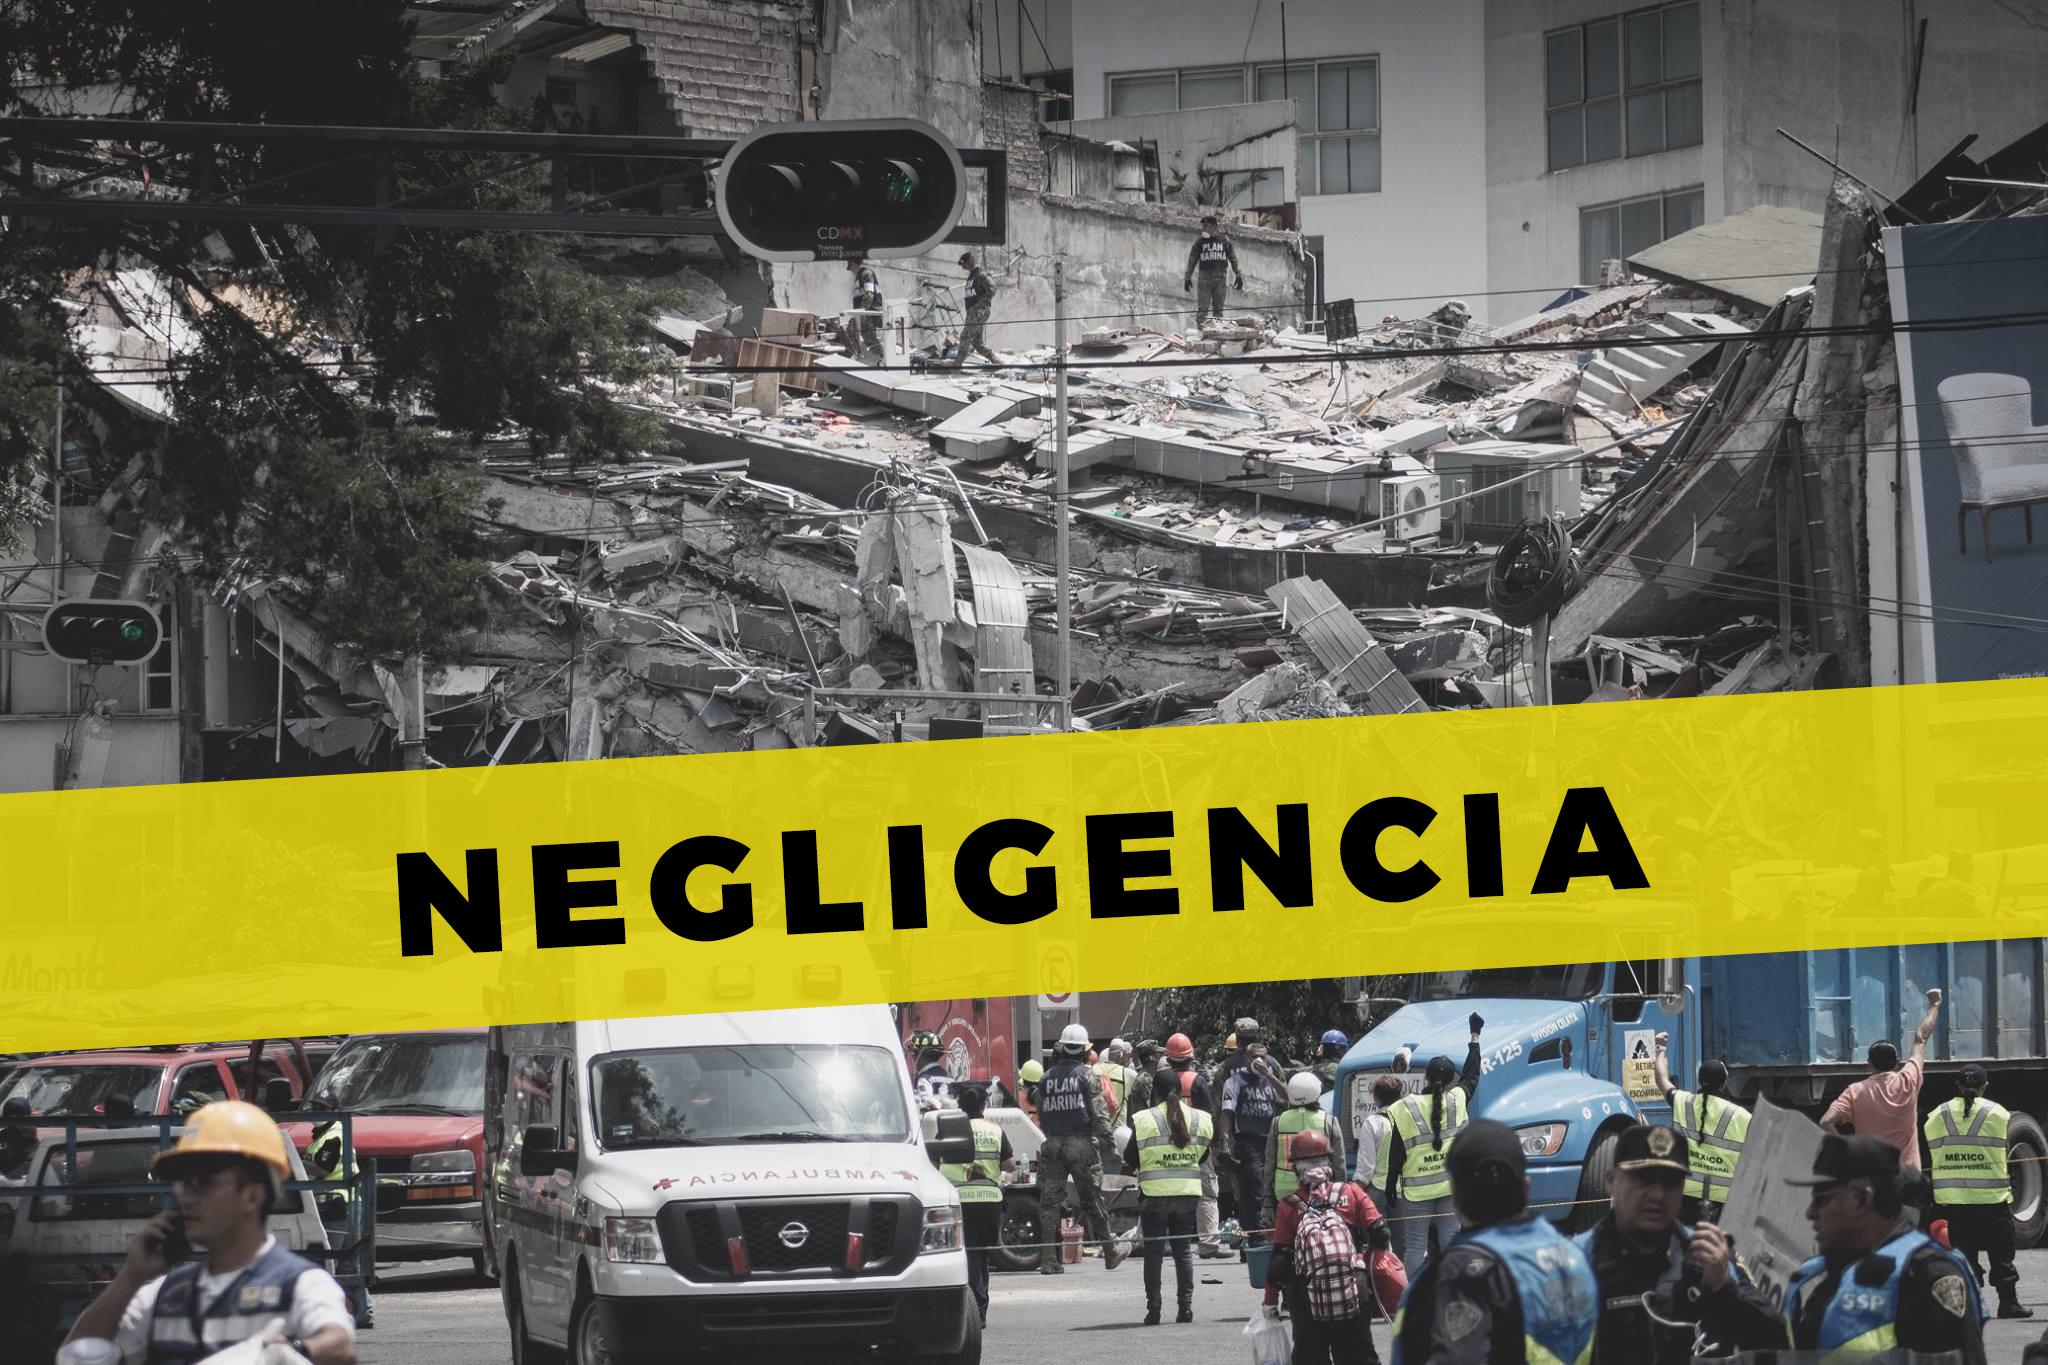 negligencia (1).png